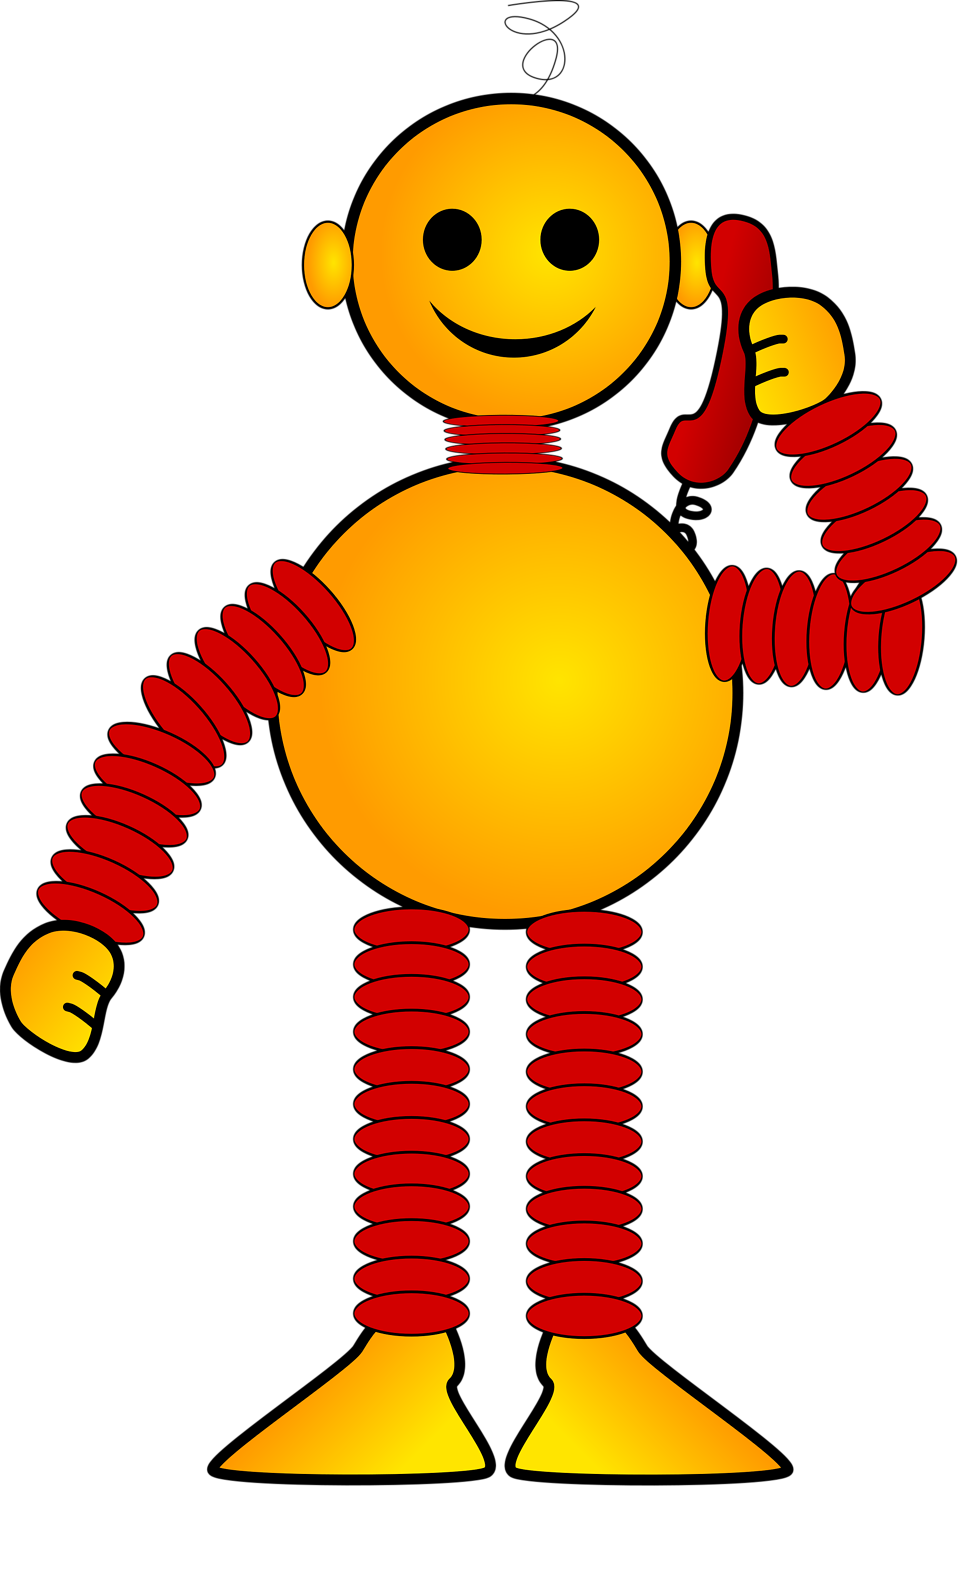 Robot car clipart clipart transparent Robot | Free Stock Photo | Illustration of an orange cartoon robot ... clipart transparent